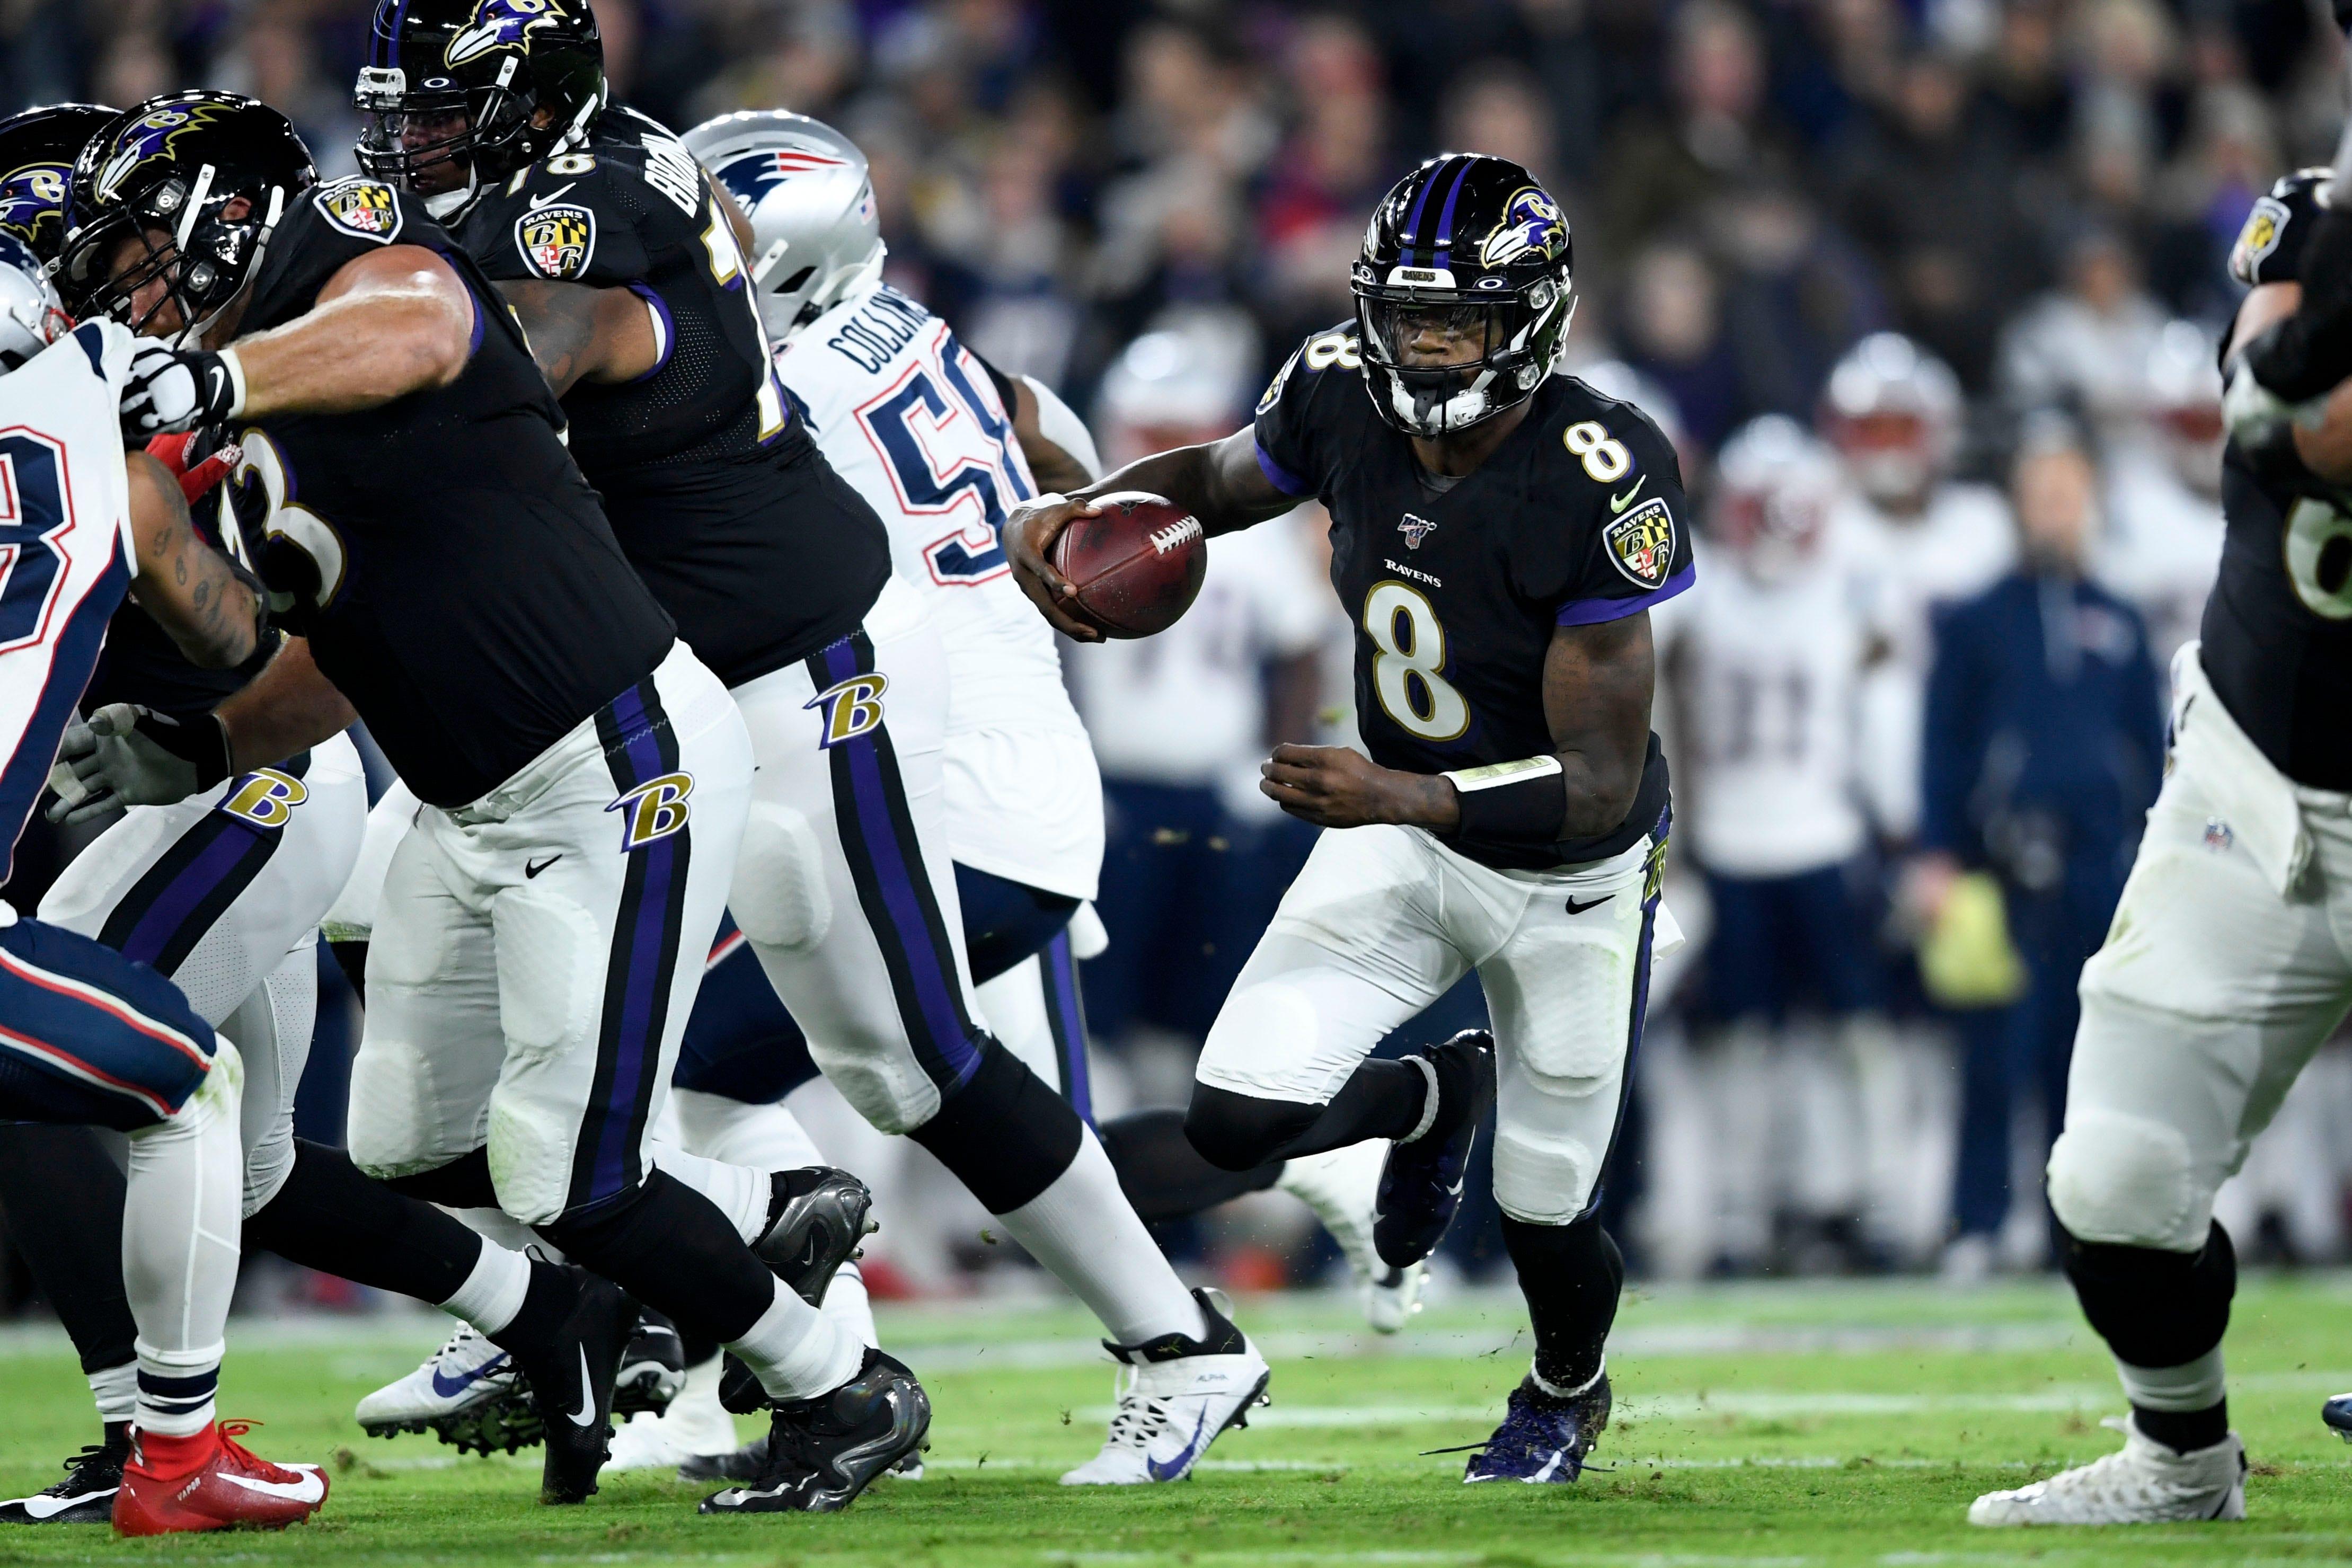 Undefeated no more: Lamar Jackson, Ravens end Patriots  bid for 16-0 season